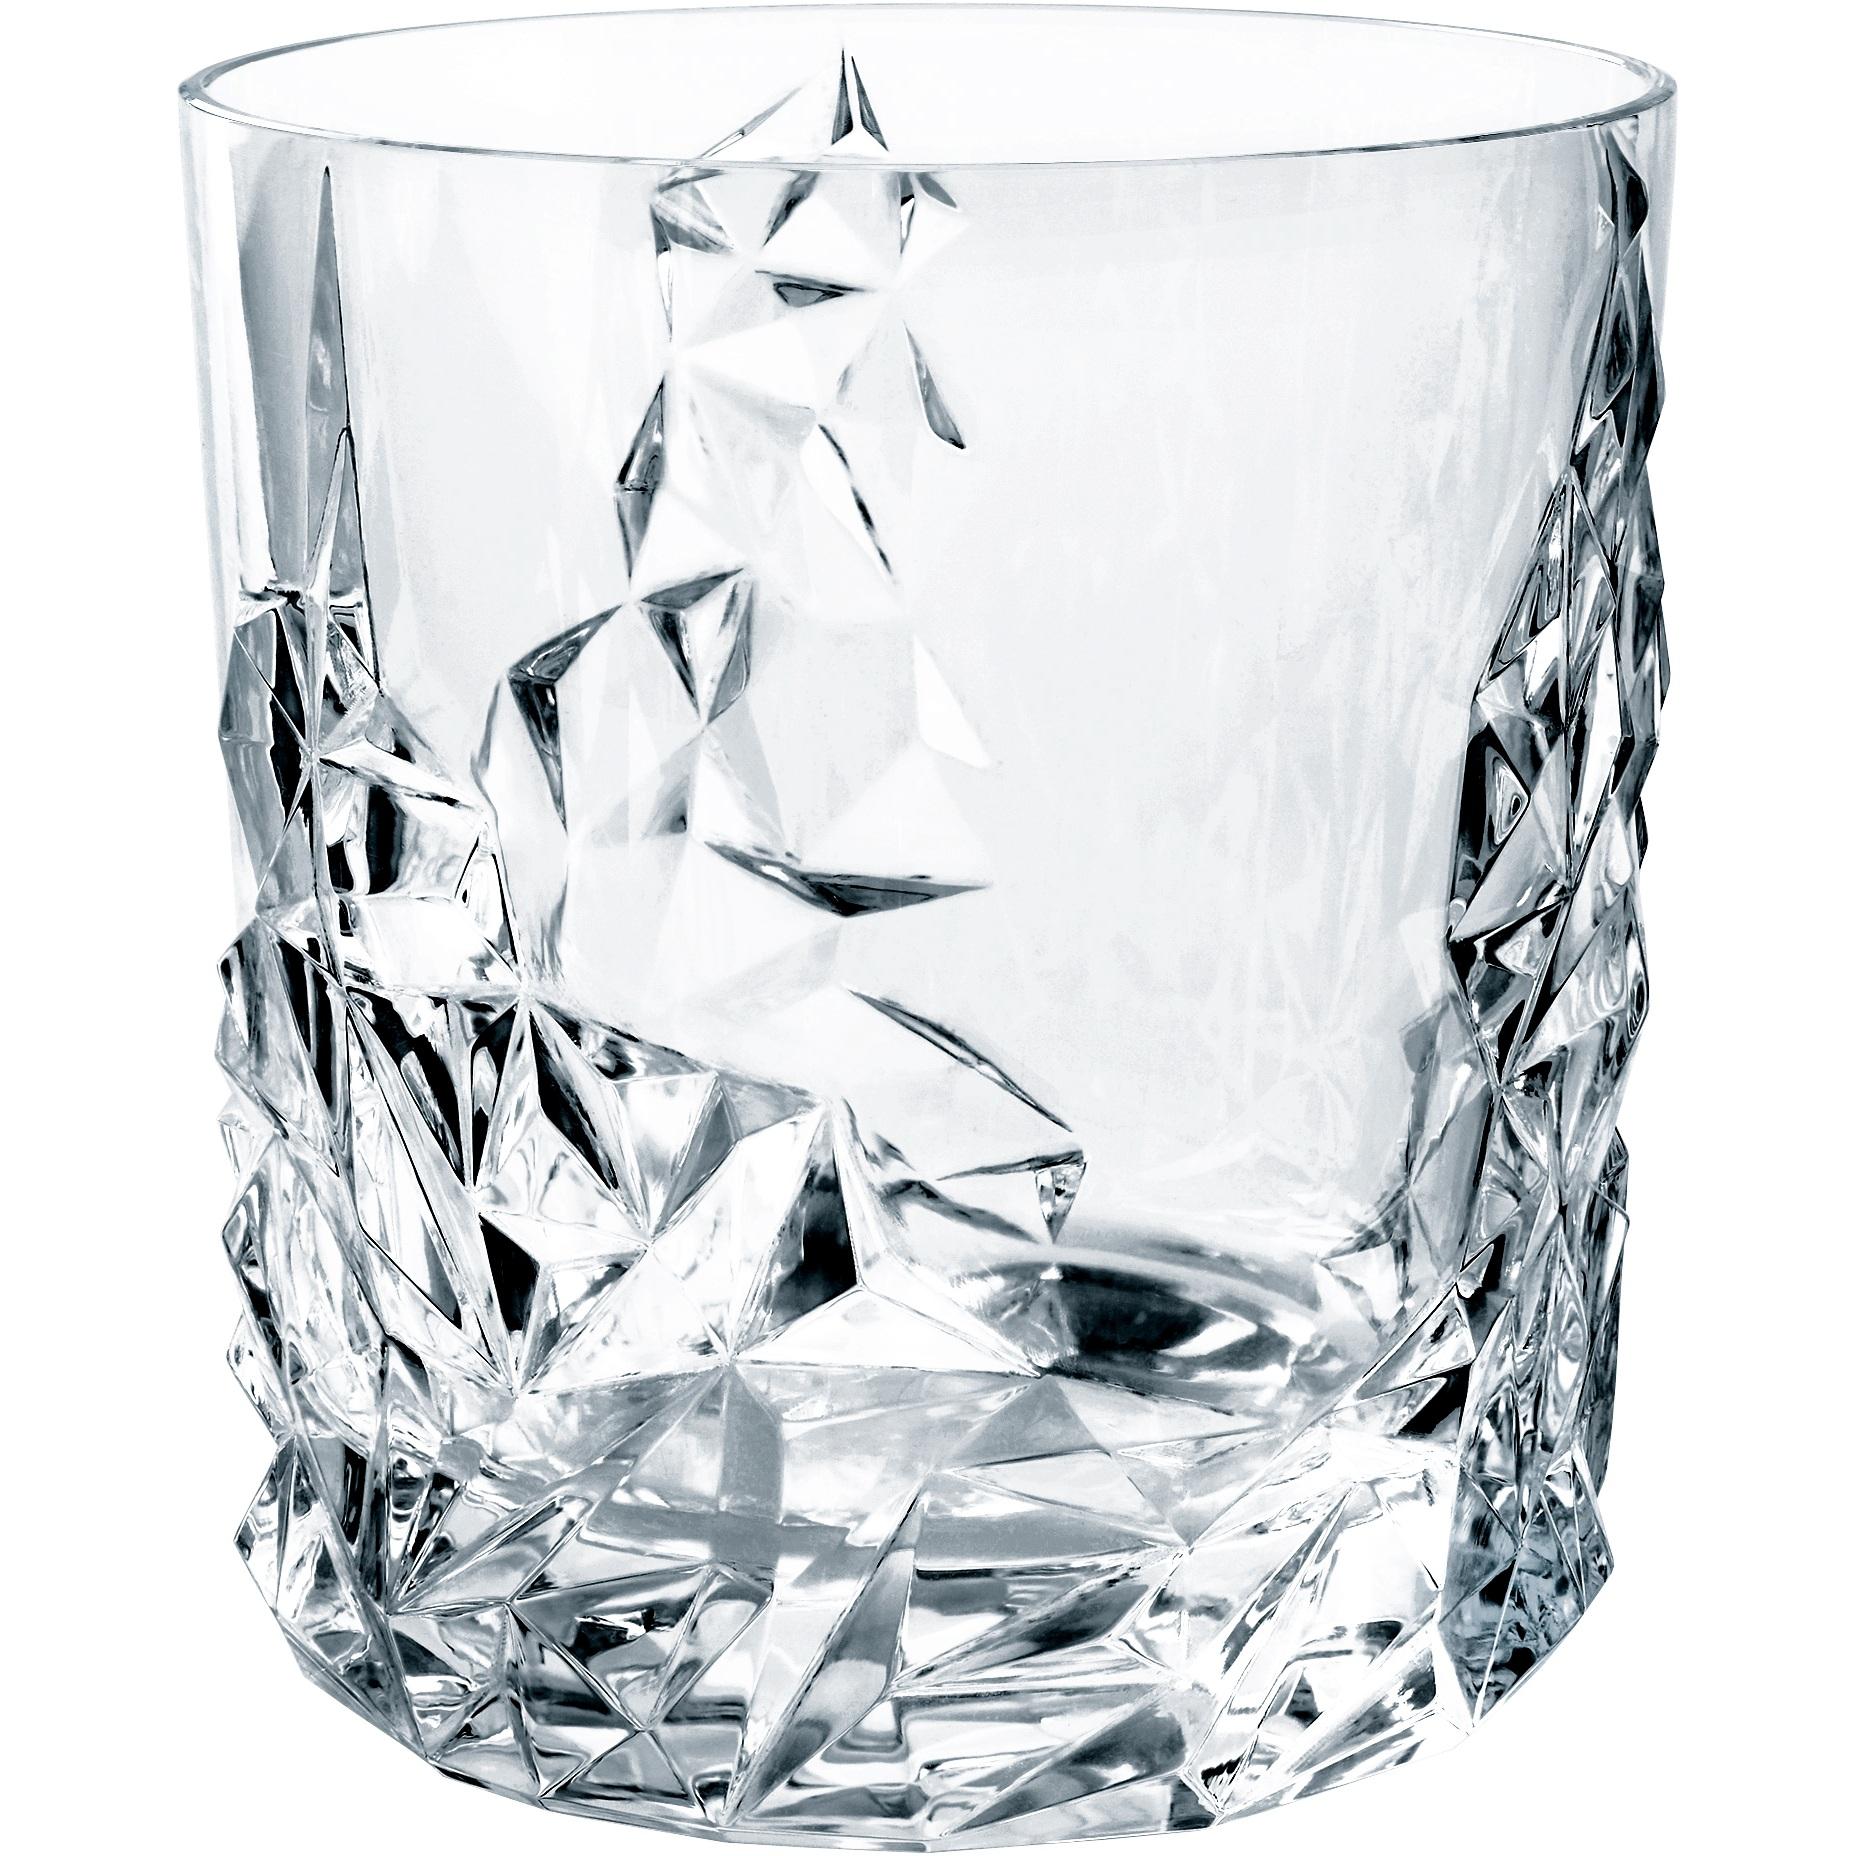 Nachtmann Sculpture Leaded Crystal Tumbler Glass, Set of 2